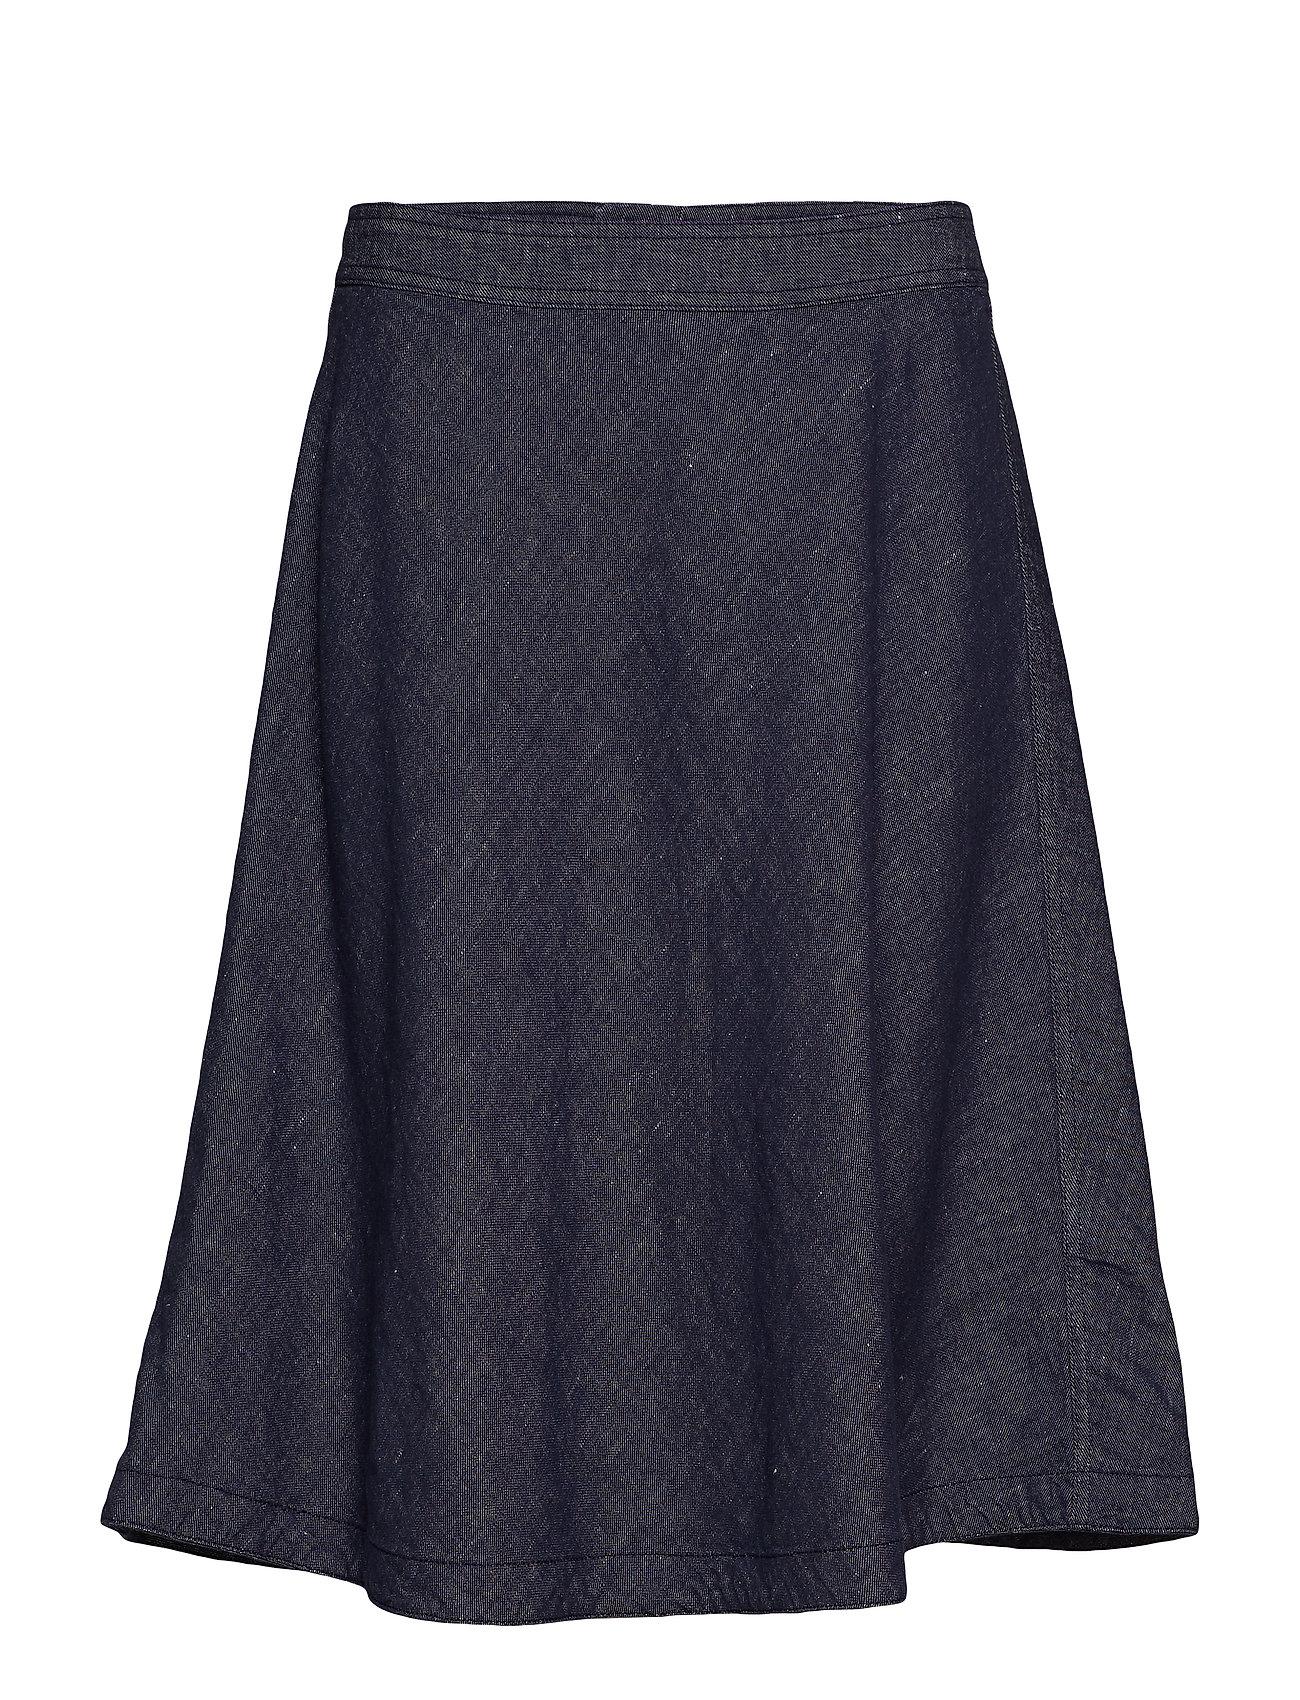 Marc O'Polo Circle Skirt - LINEN DENIM